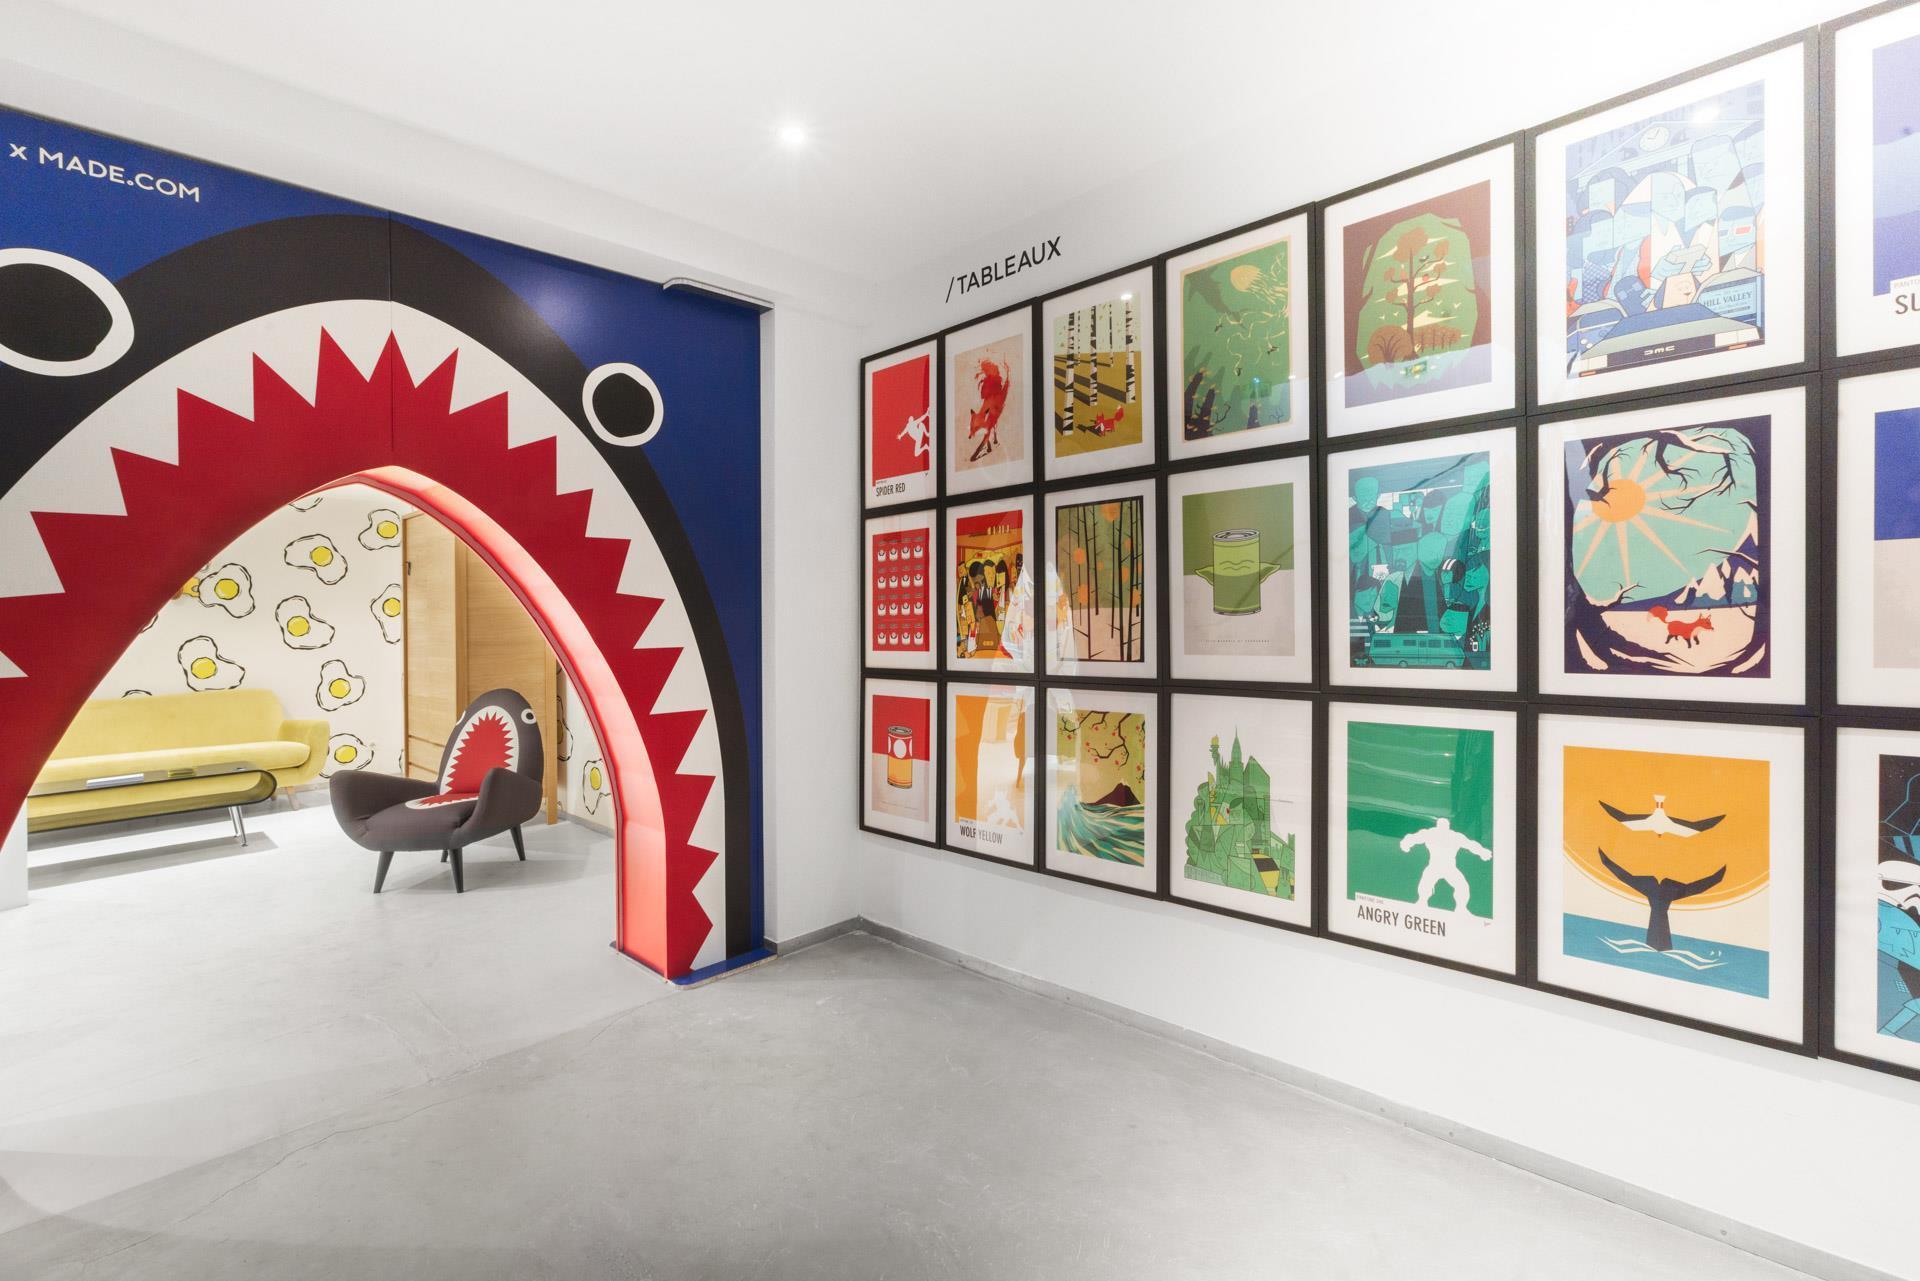 store of the week uses digital storytelling in. Black Bedroom Furniture Sets. Home Design Ideas